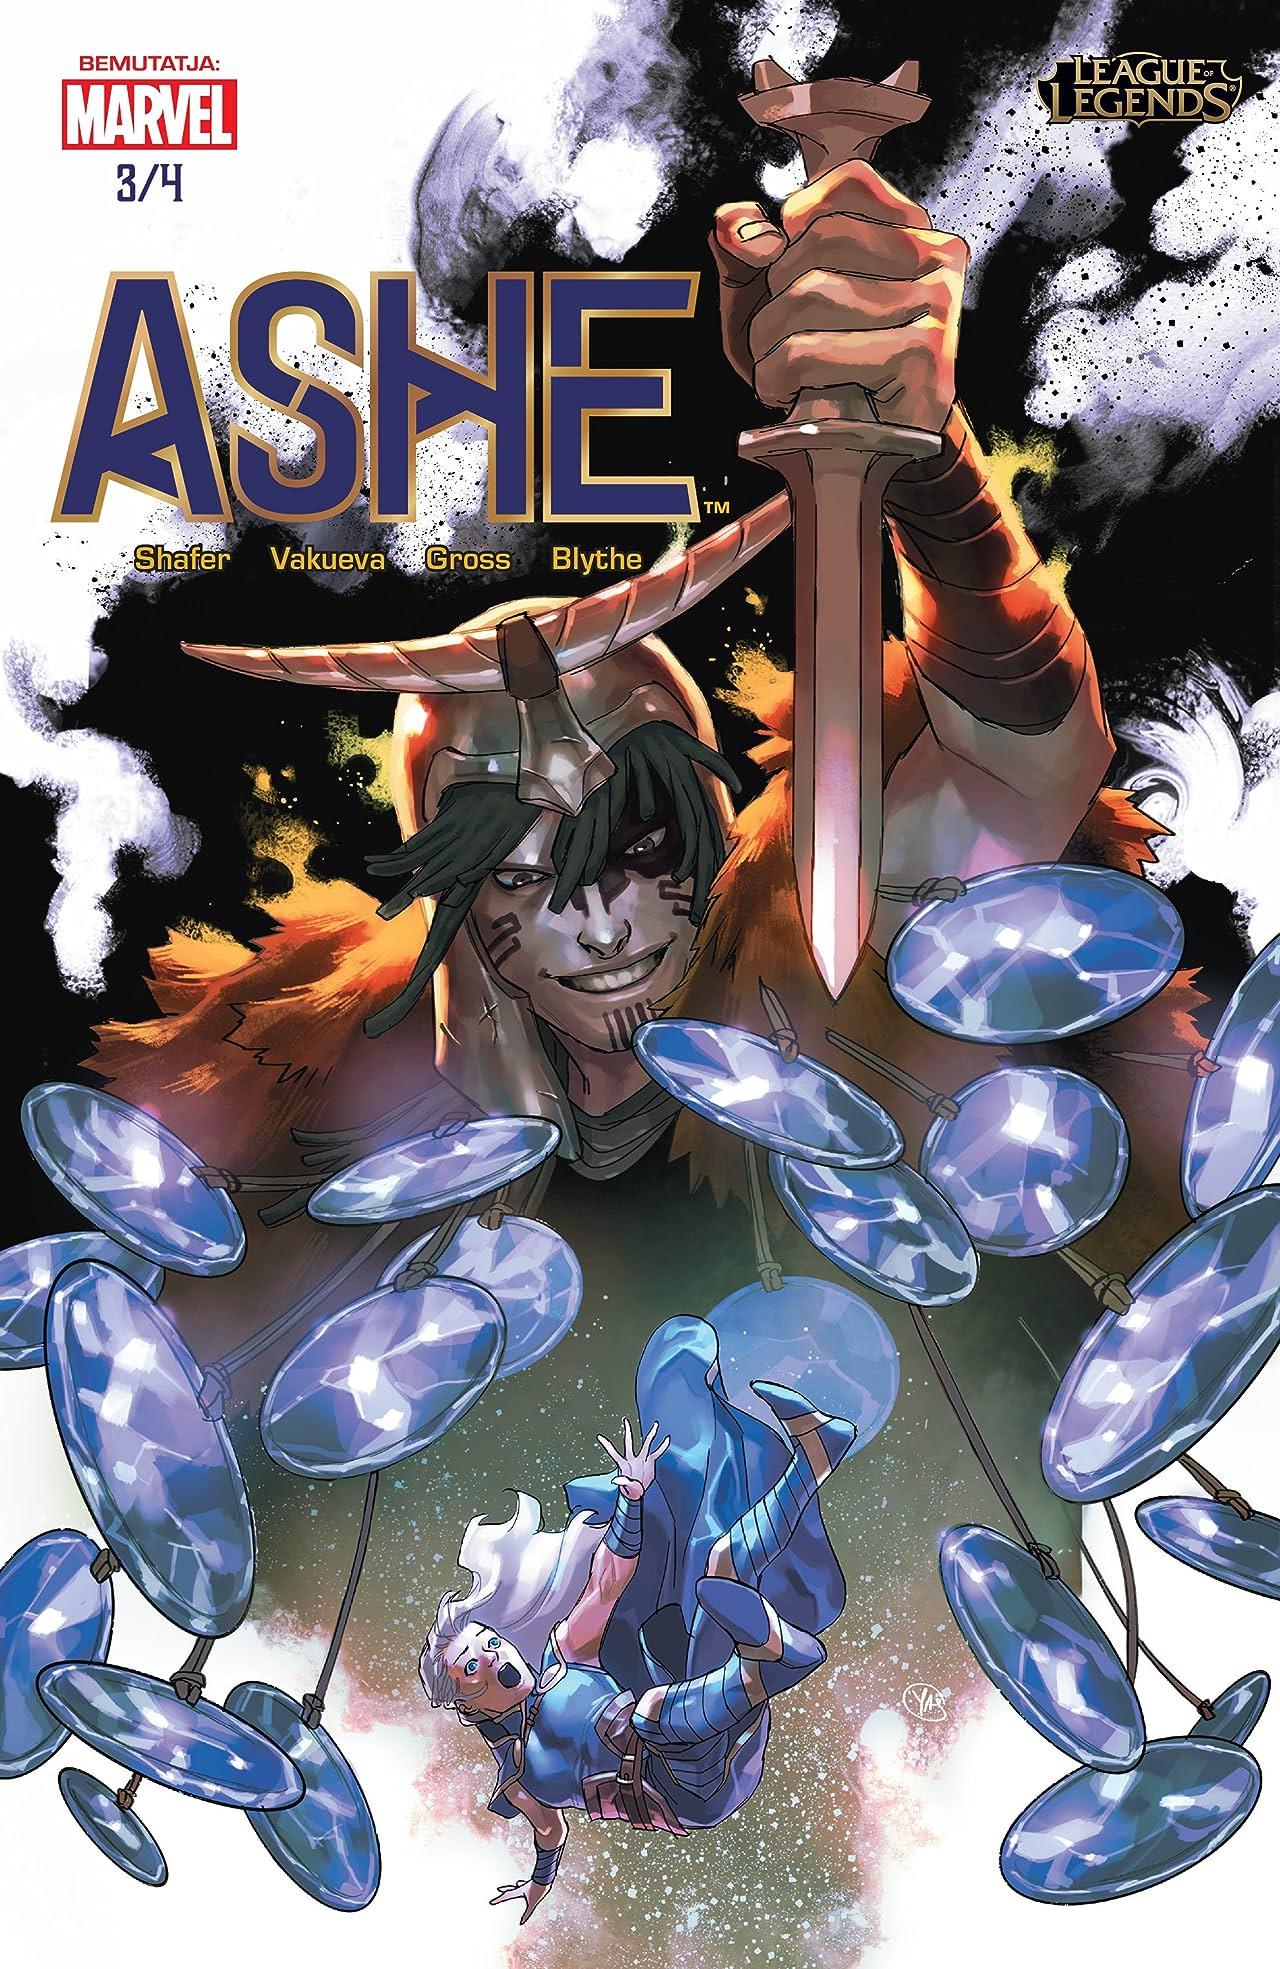 League of Legends: Ashe: A Hadfőnök Képregénysorozat Gyűjteménye Special Edition (Hungarian) No.3 (sur 4)